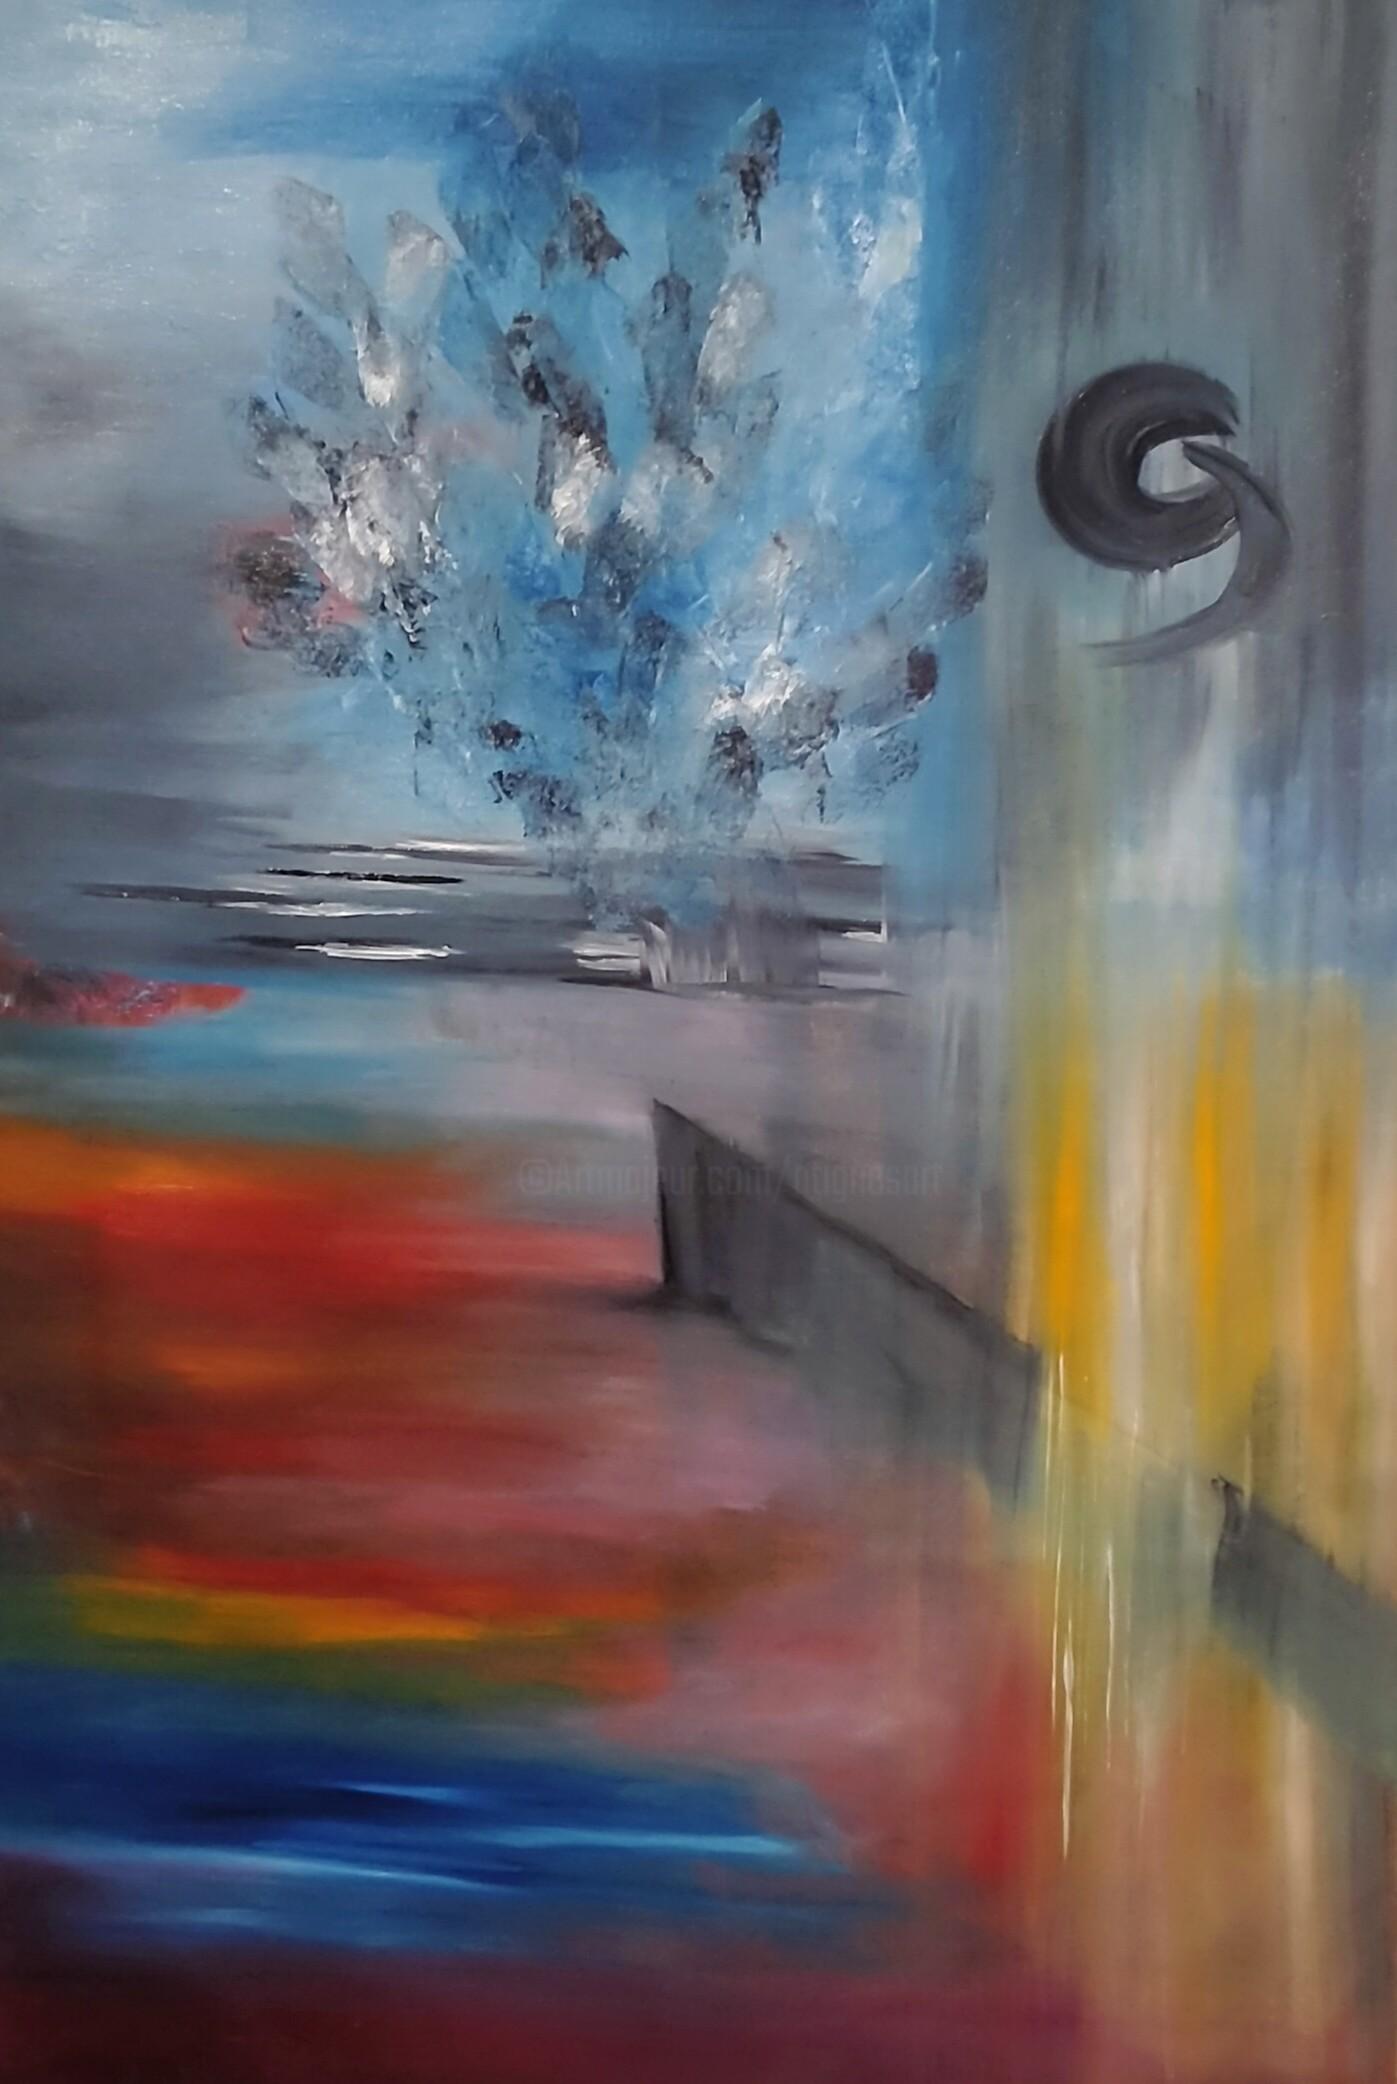 Atignas Art - Walking down the memory lane